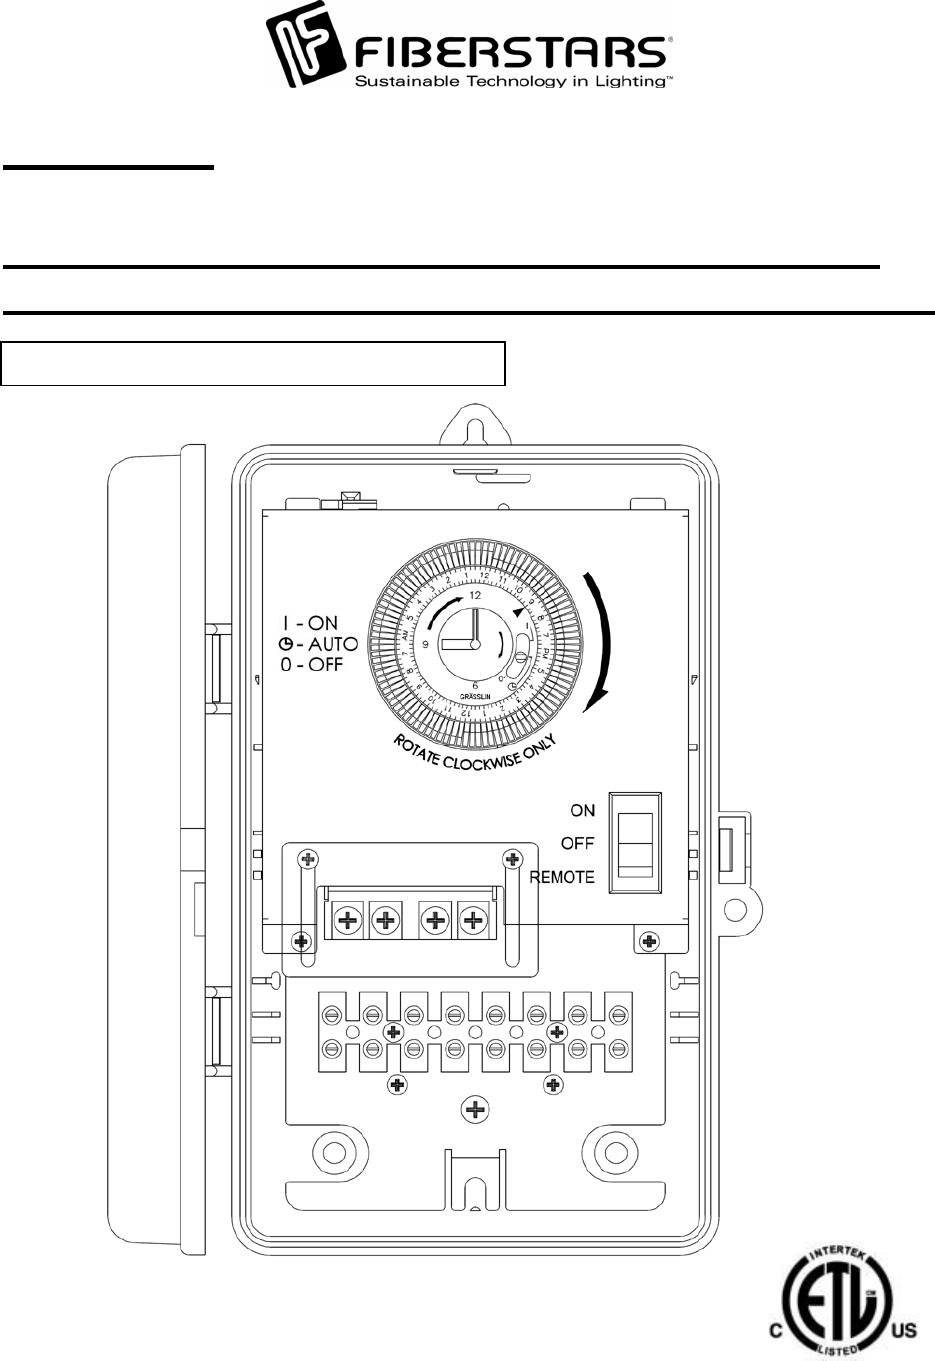 Fiberstars Wpc04 Wireless Controller For Swimming Pool Peripherals Diagram User Manual Wpc 1